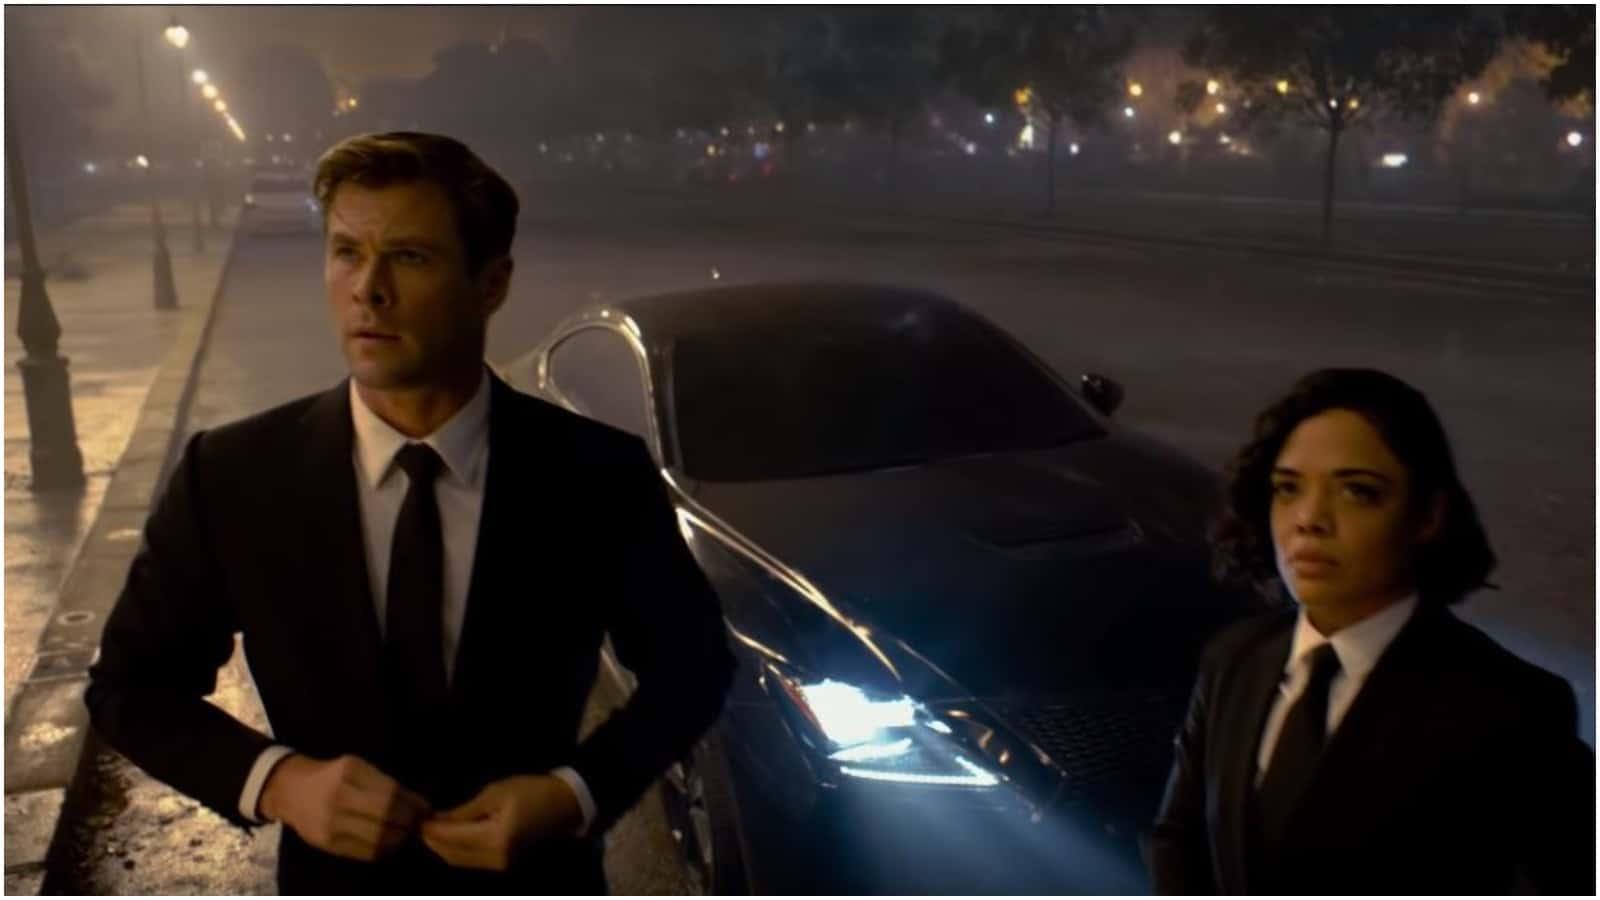 See Tessa Thompson, Chris Hemsworth in 'Men In Black International' Trailer